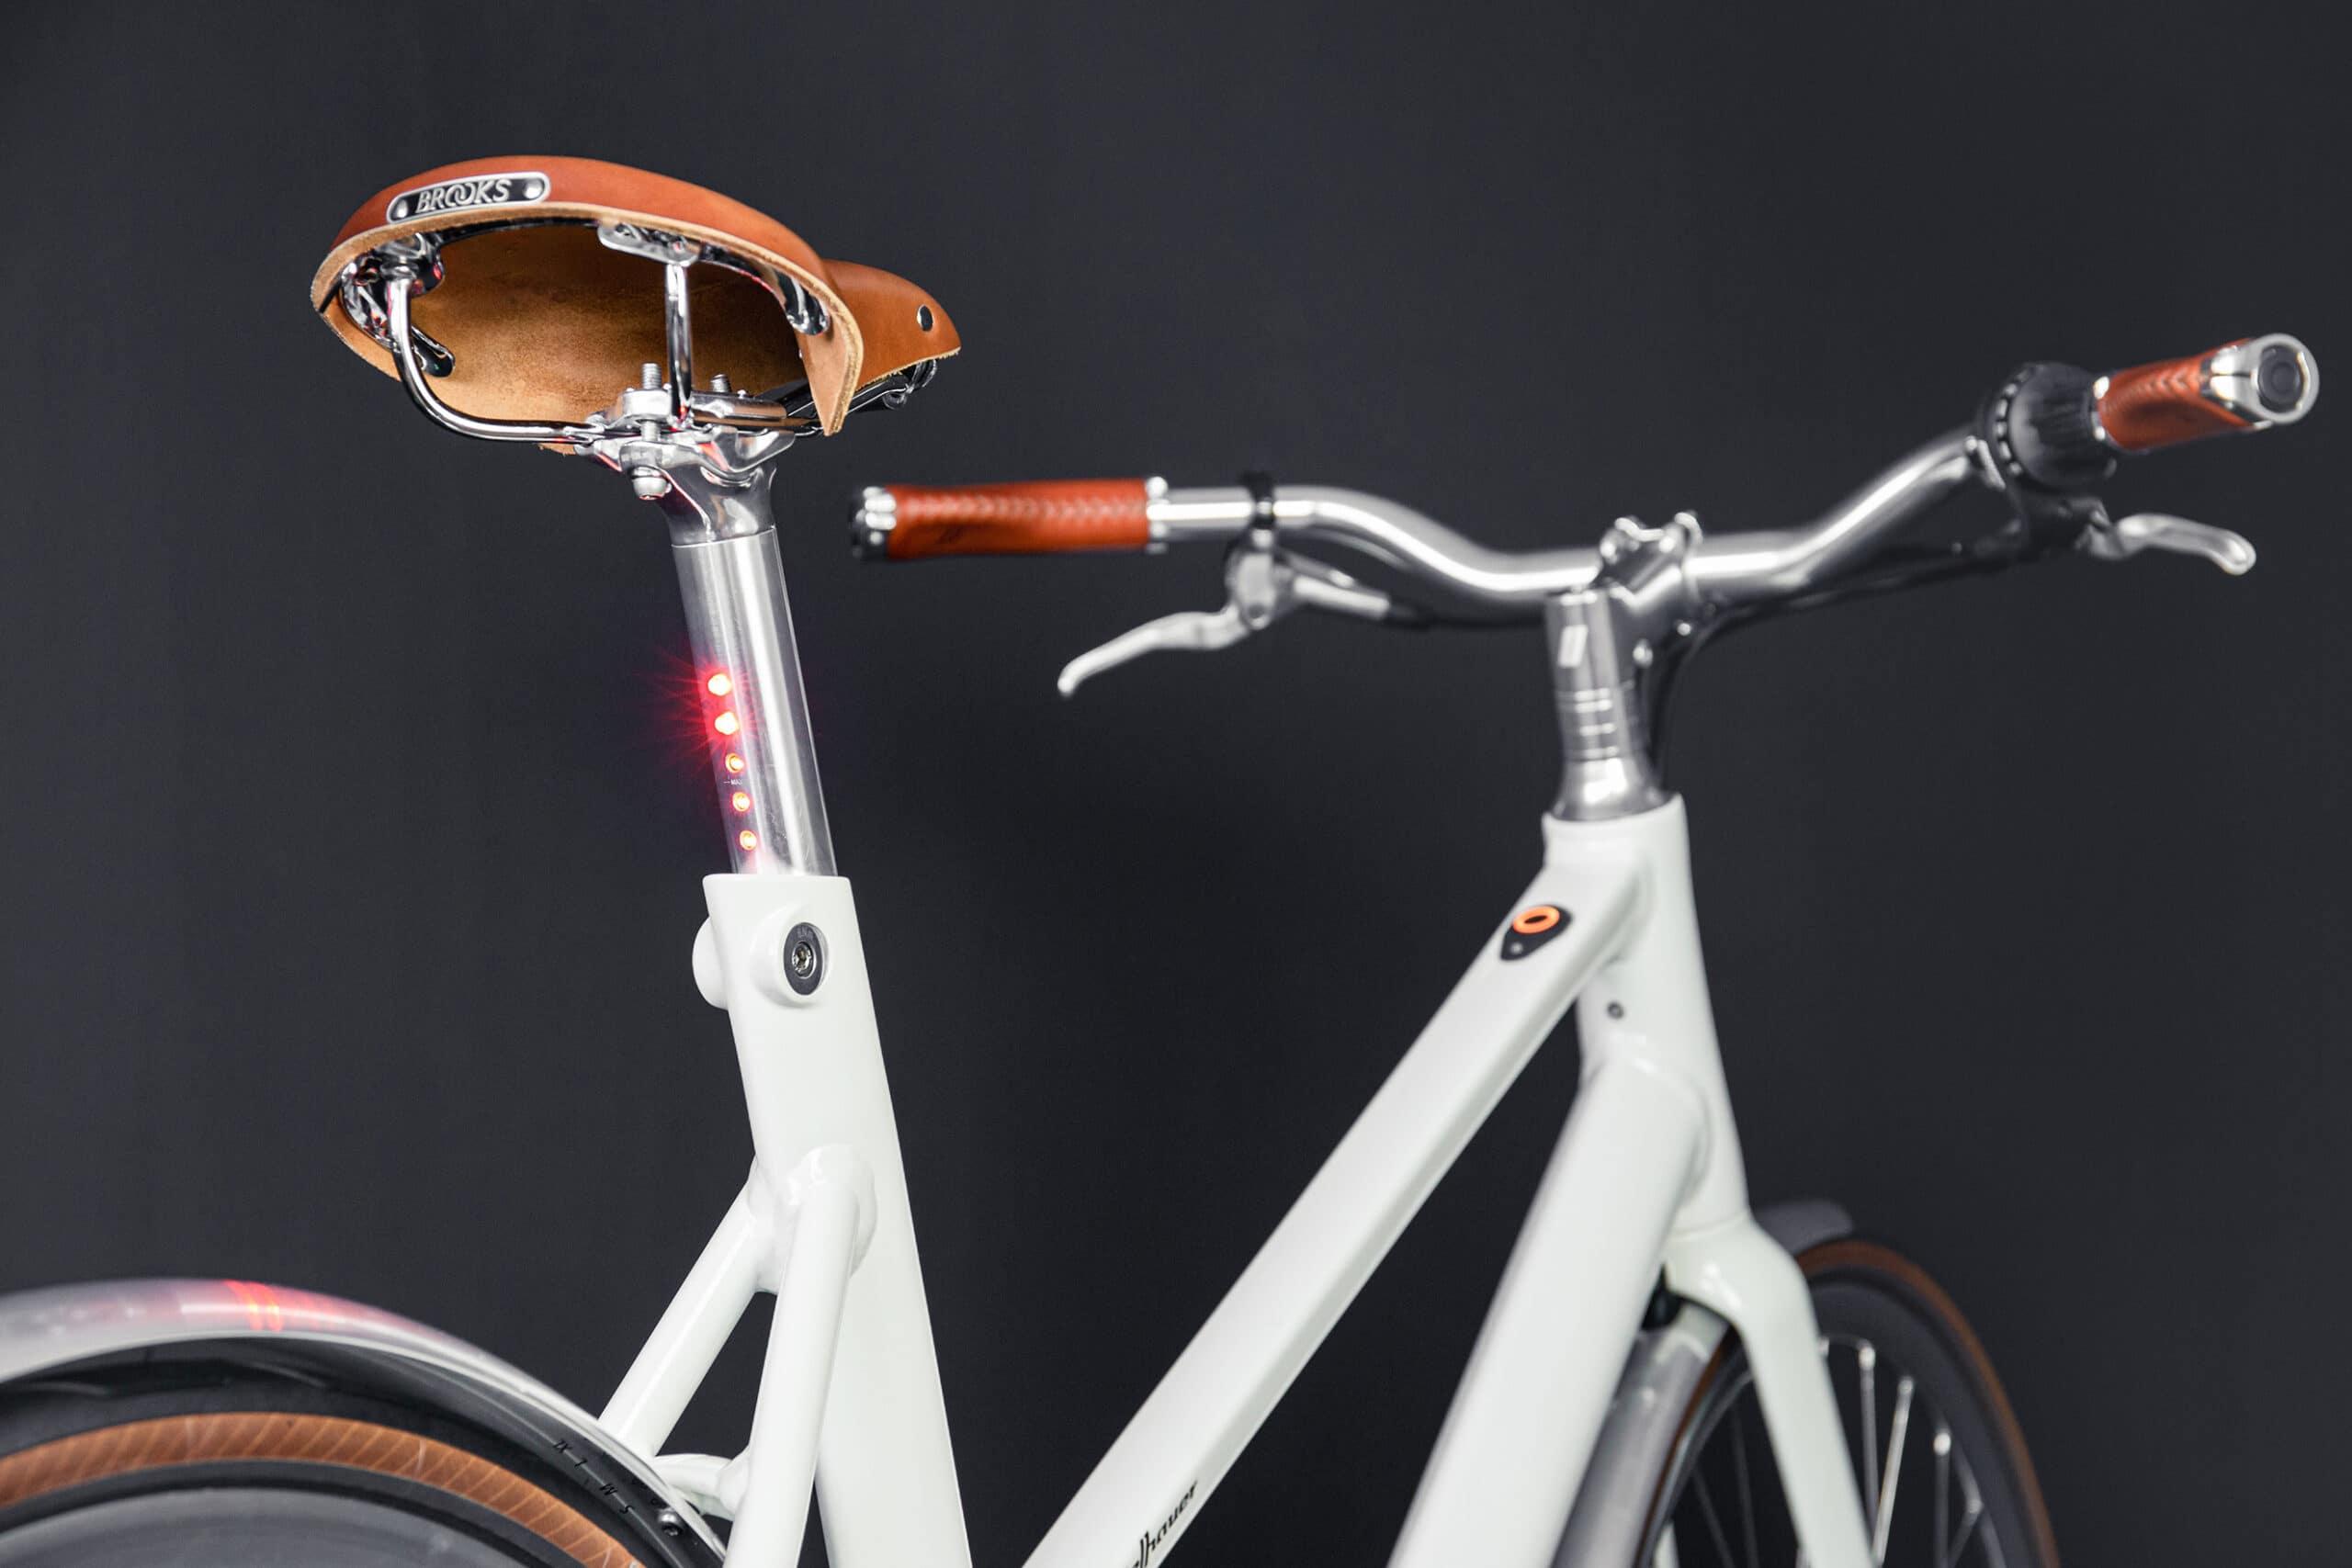 schindelhauer Antonia Pinion e-bike -5